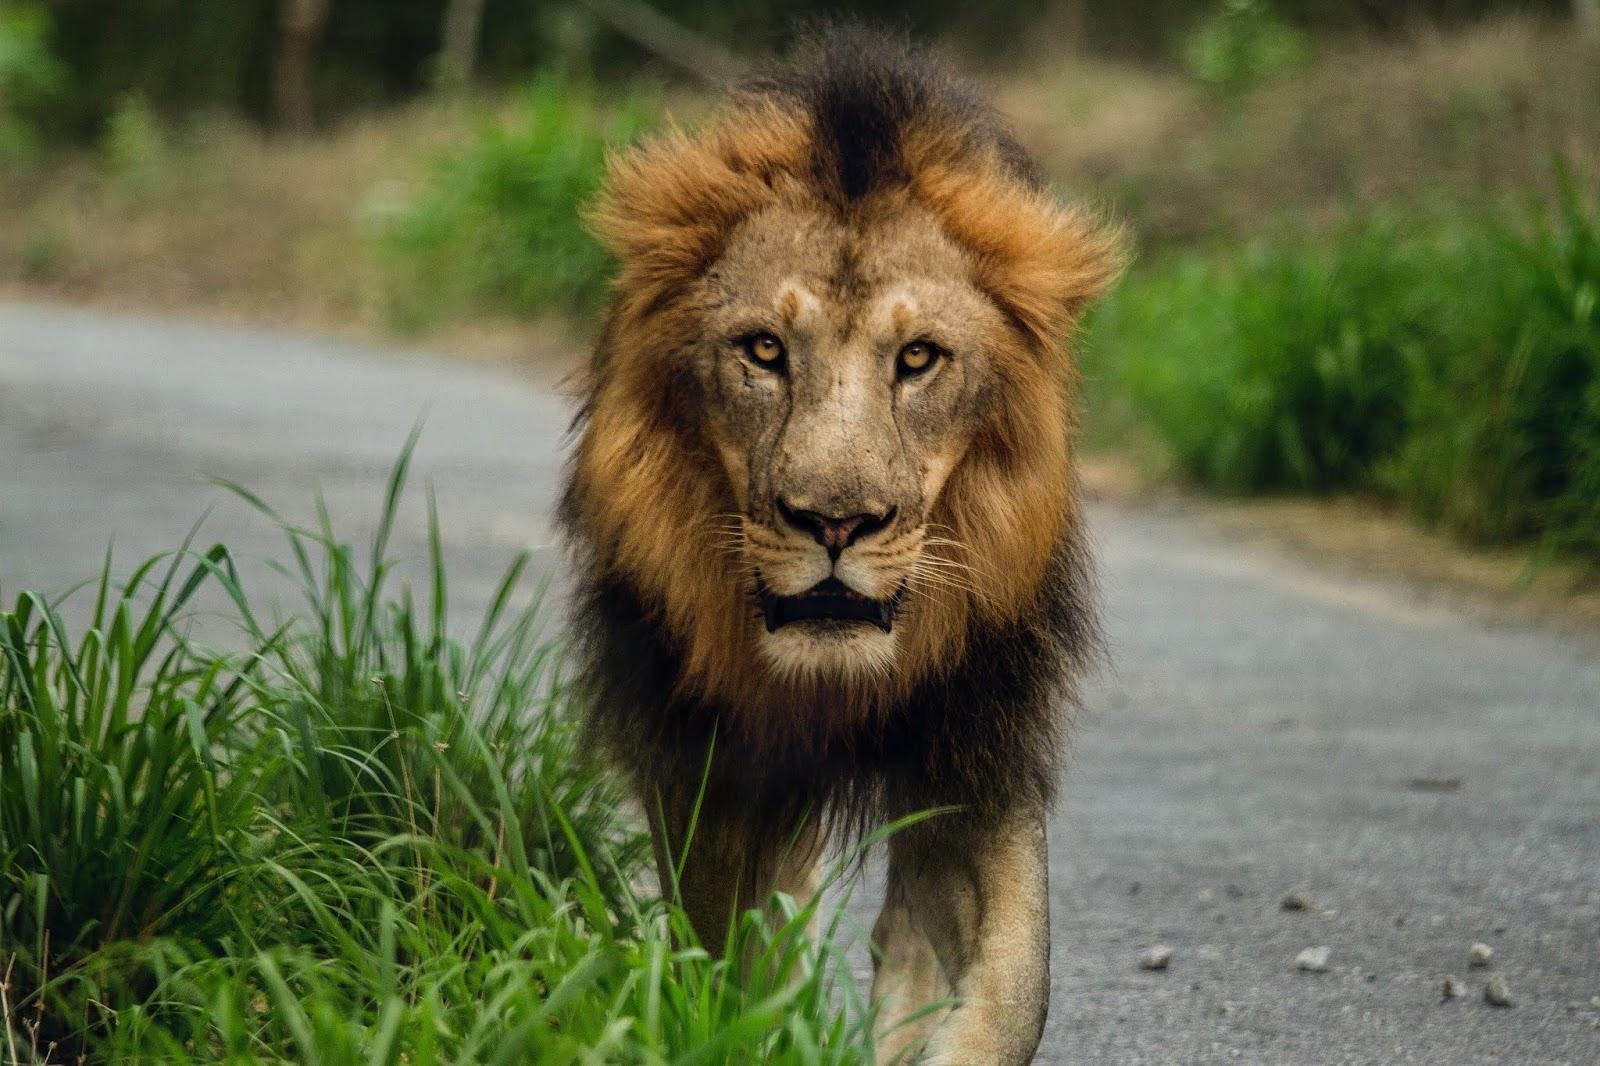 Furious Lion walking down images